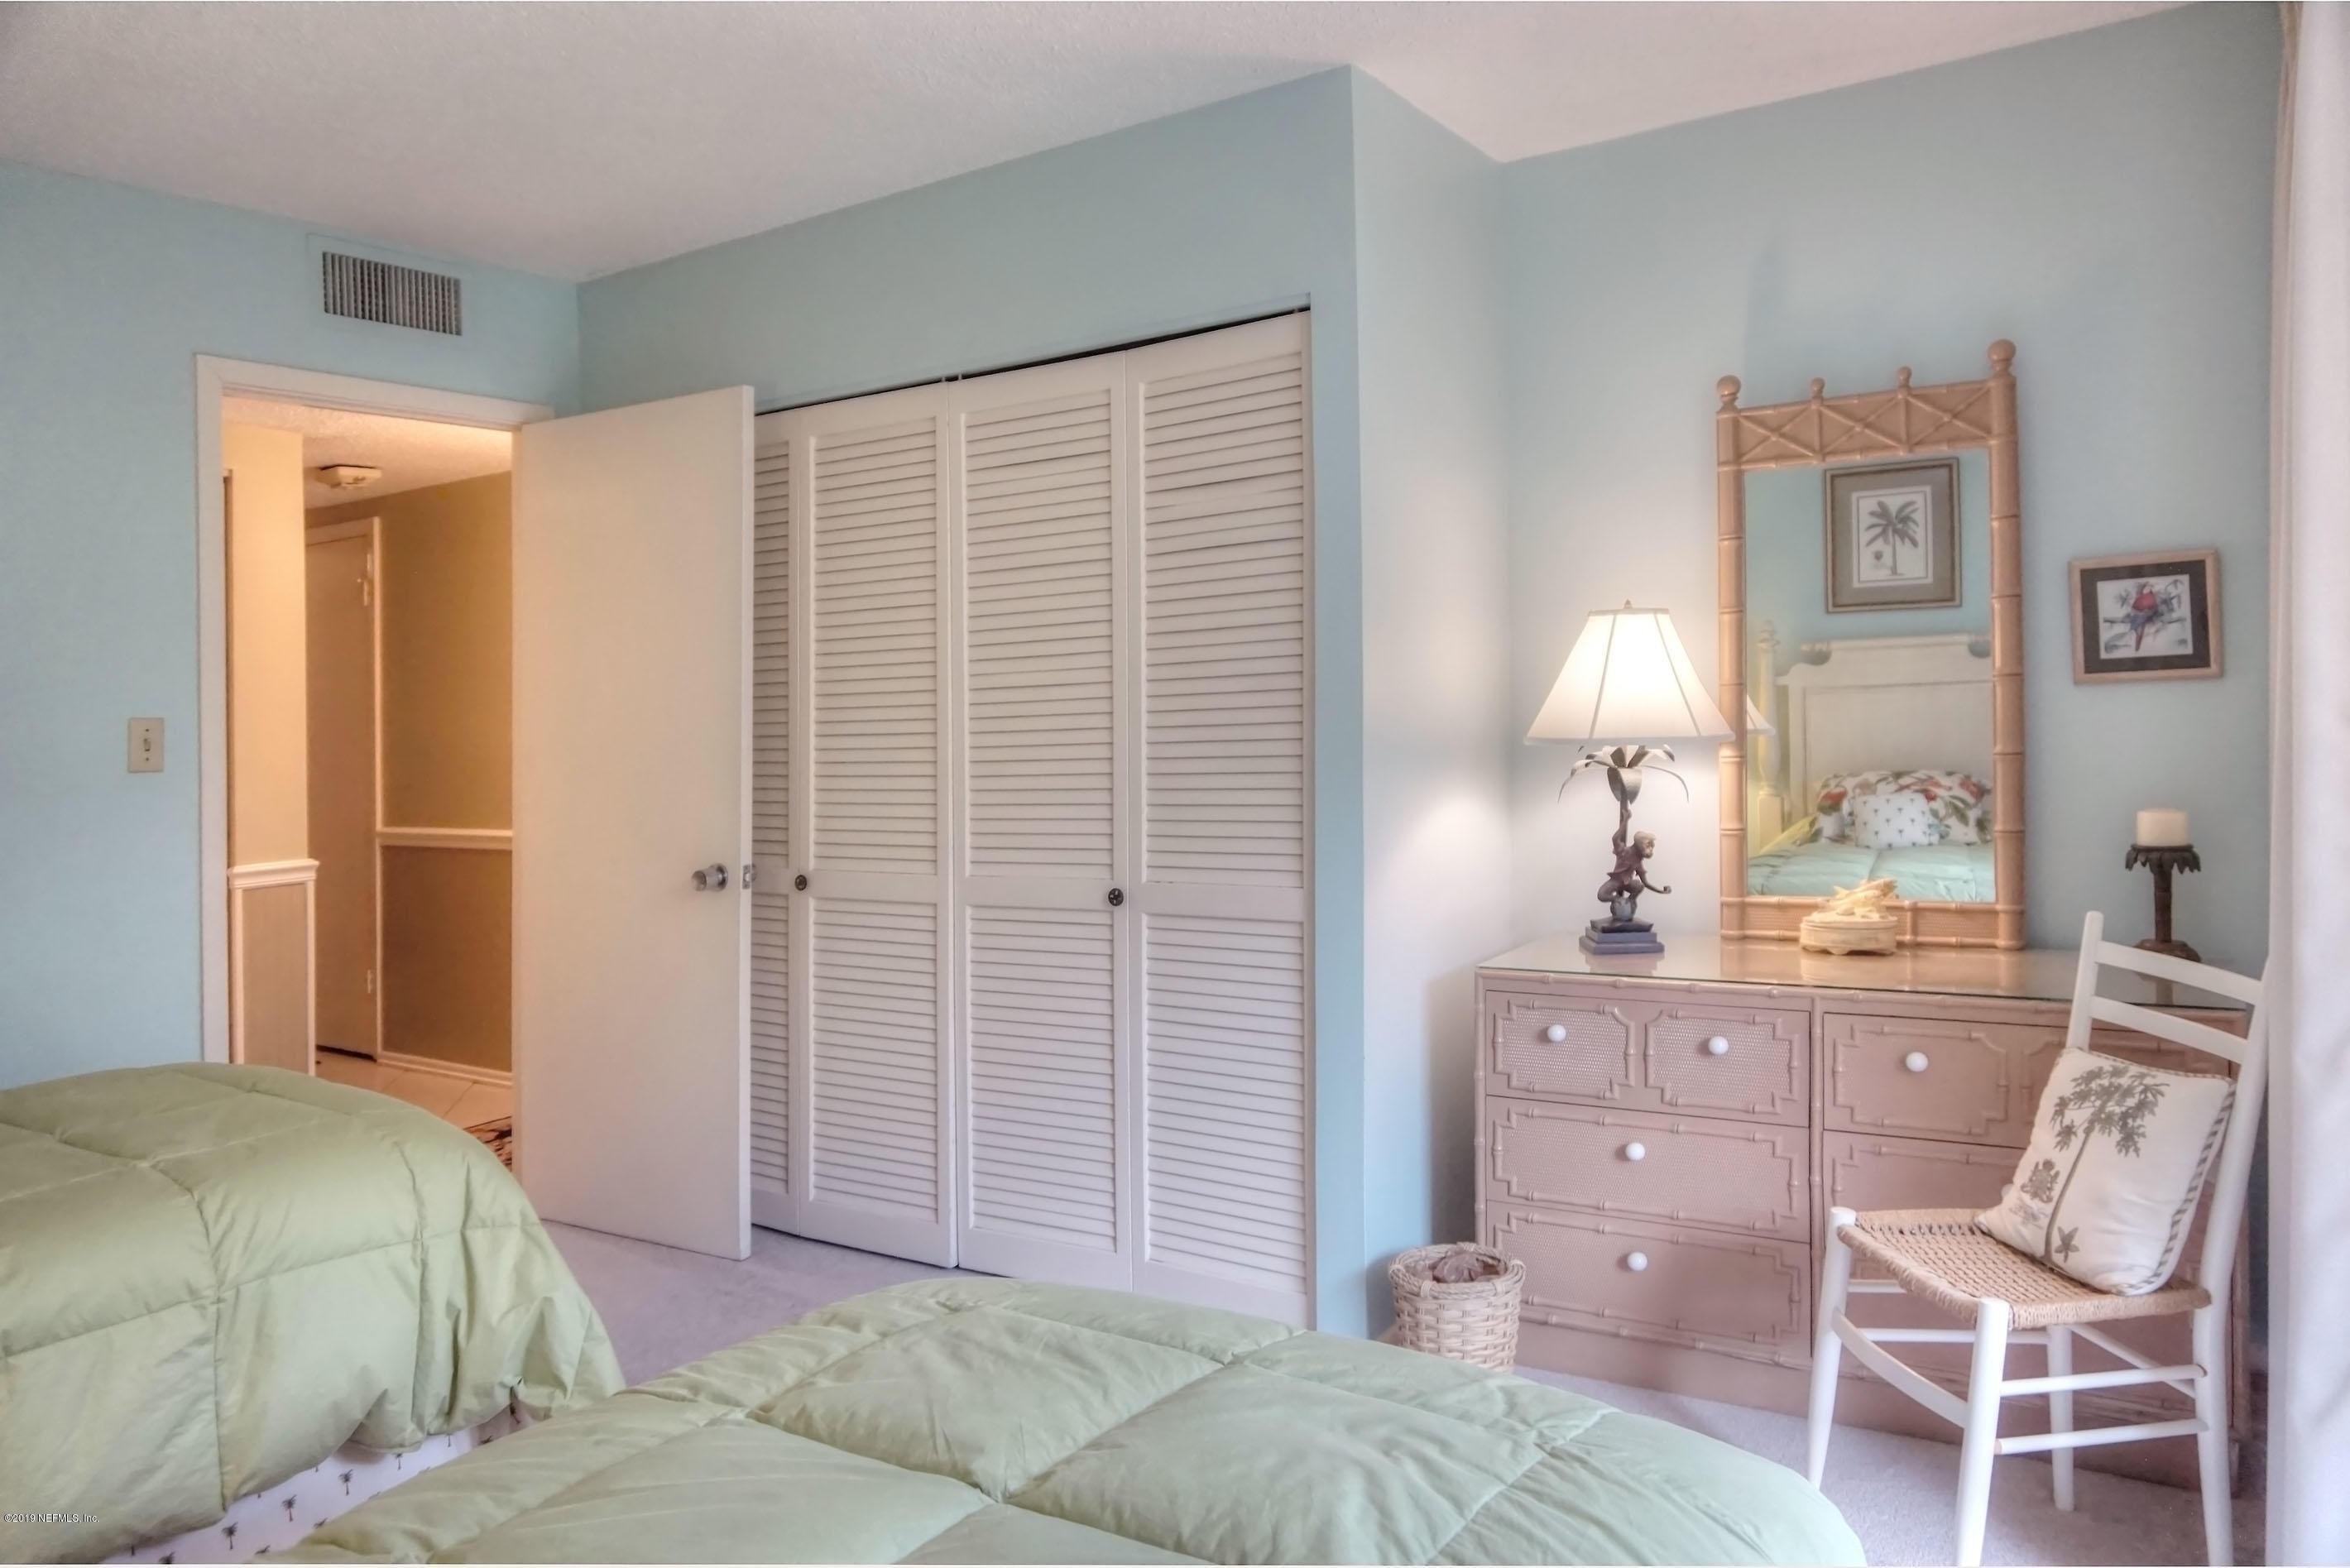 FERNANDINA BEACH, FLORIDA 32034, 2 Bedrooms Bedrooms, ,2 BathroomsBathrooms,Condo,For sale,1019525